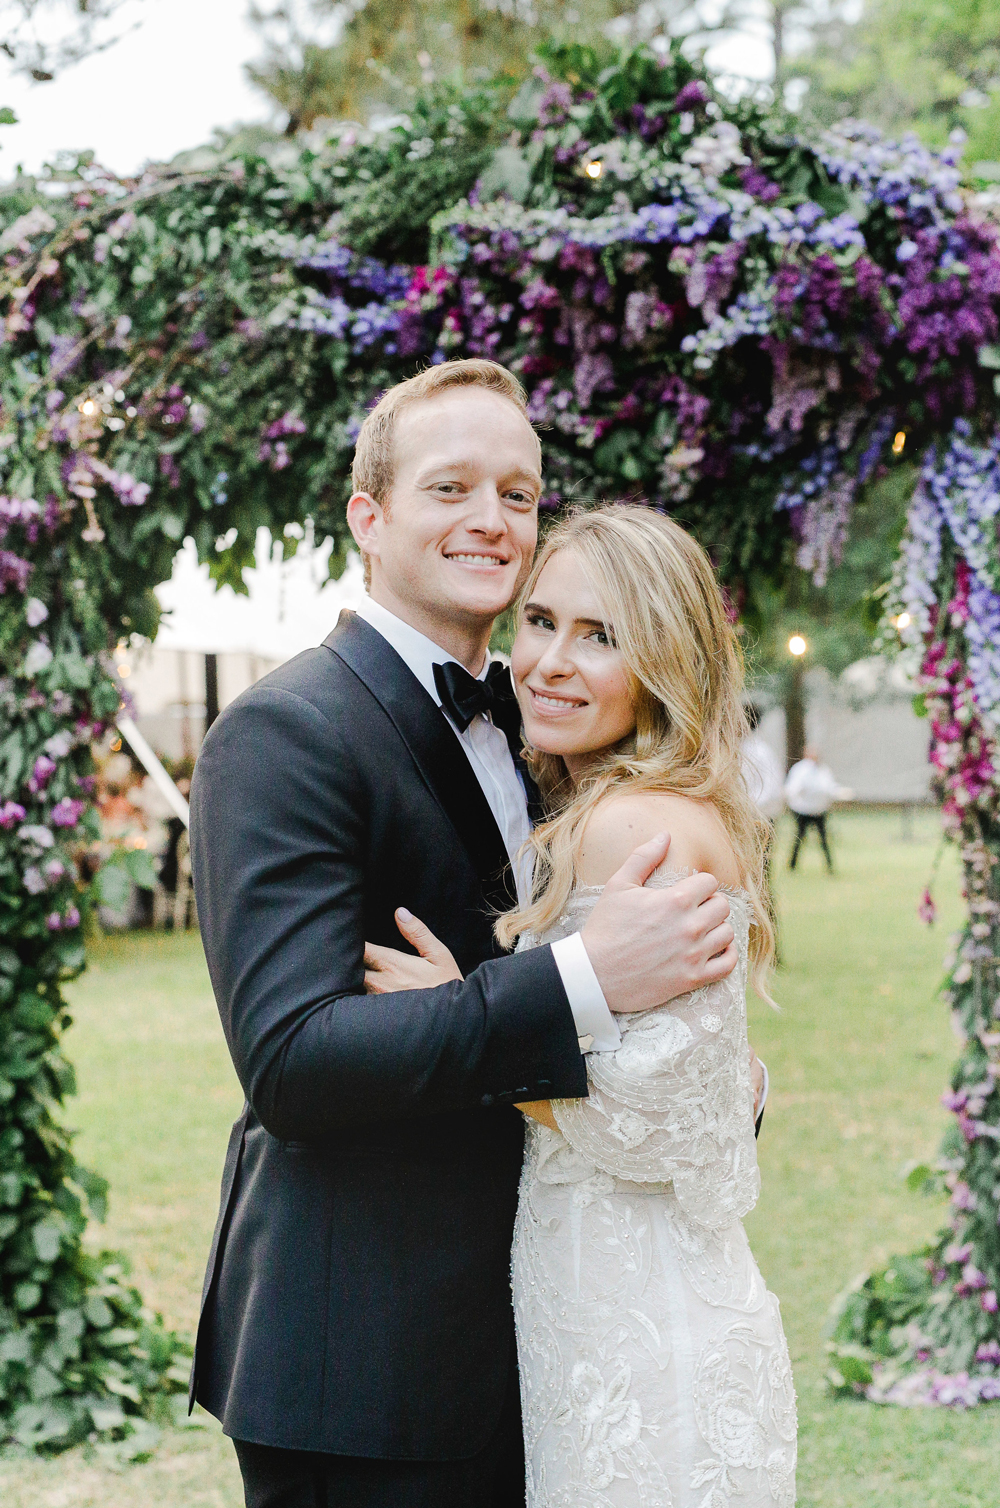 julia mitchell wedding couple embracing and smiling